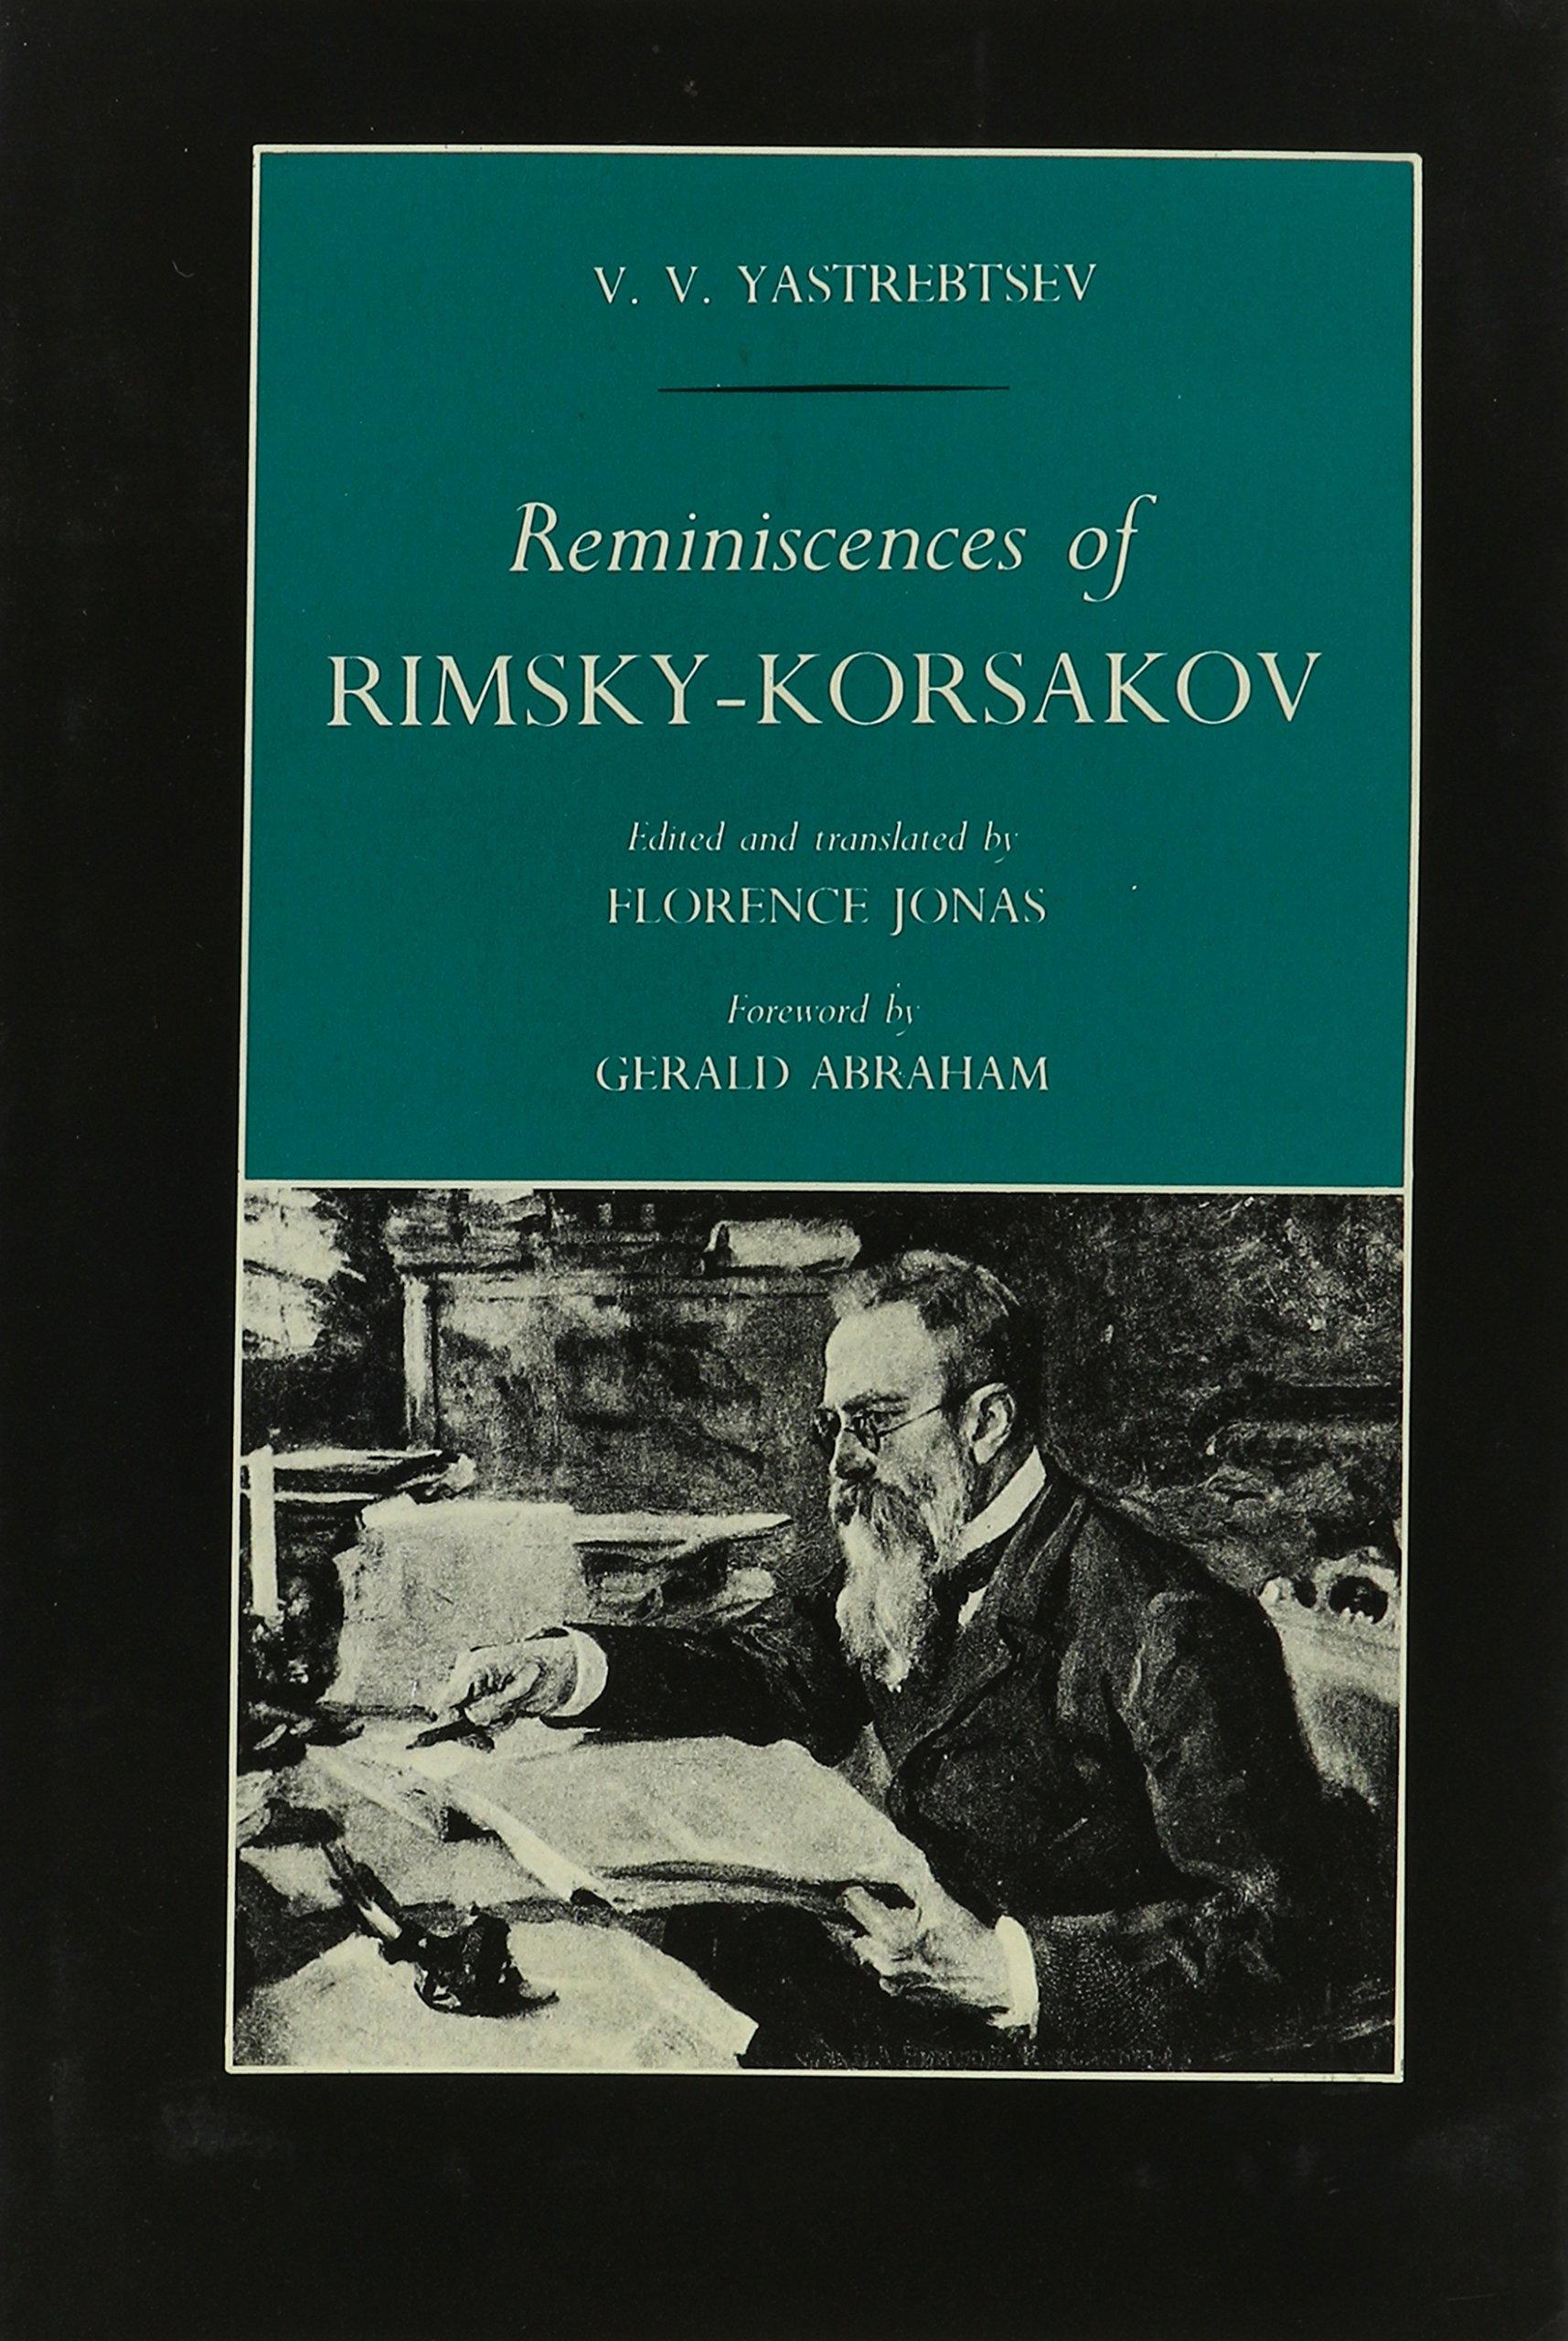 Reminiscences of Rimsky-Korsakov